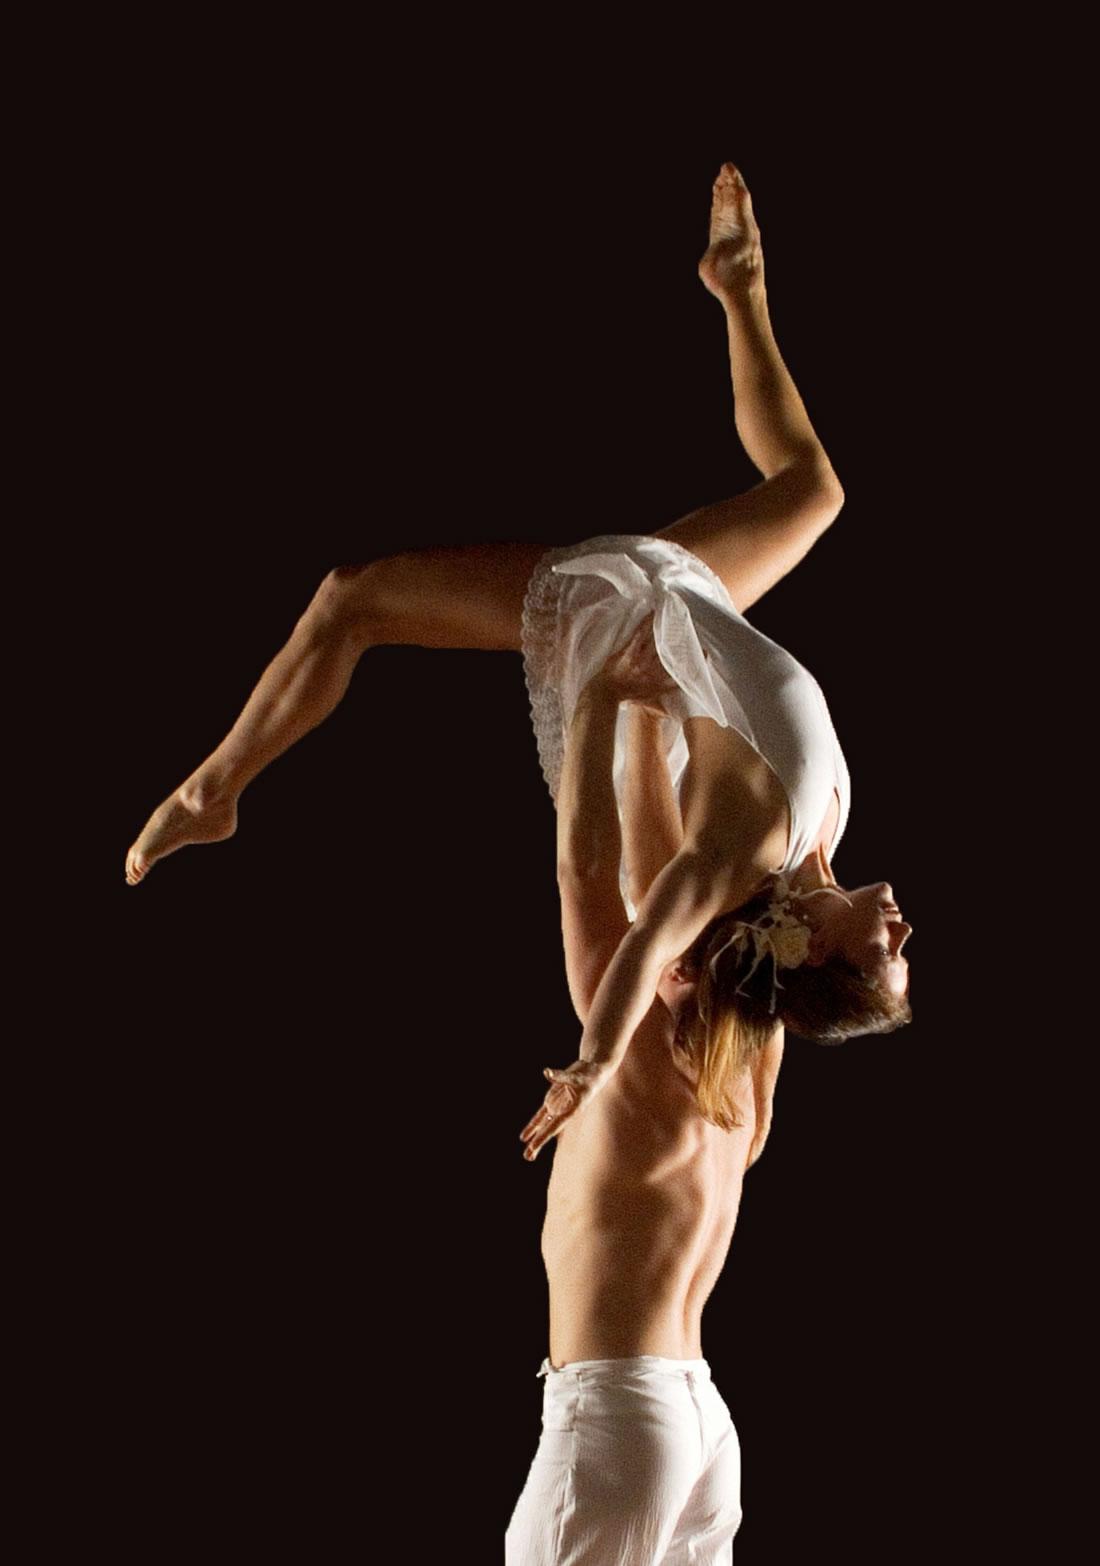 Groundbased Shows - Acrobats Gallery - Acrobatic duet